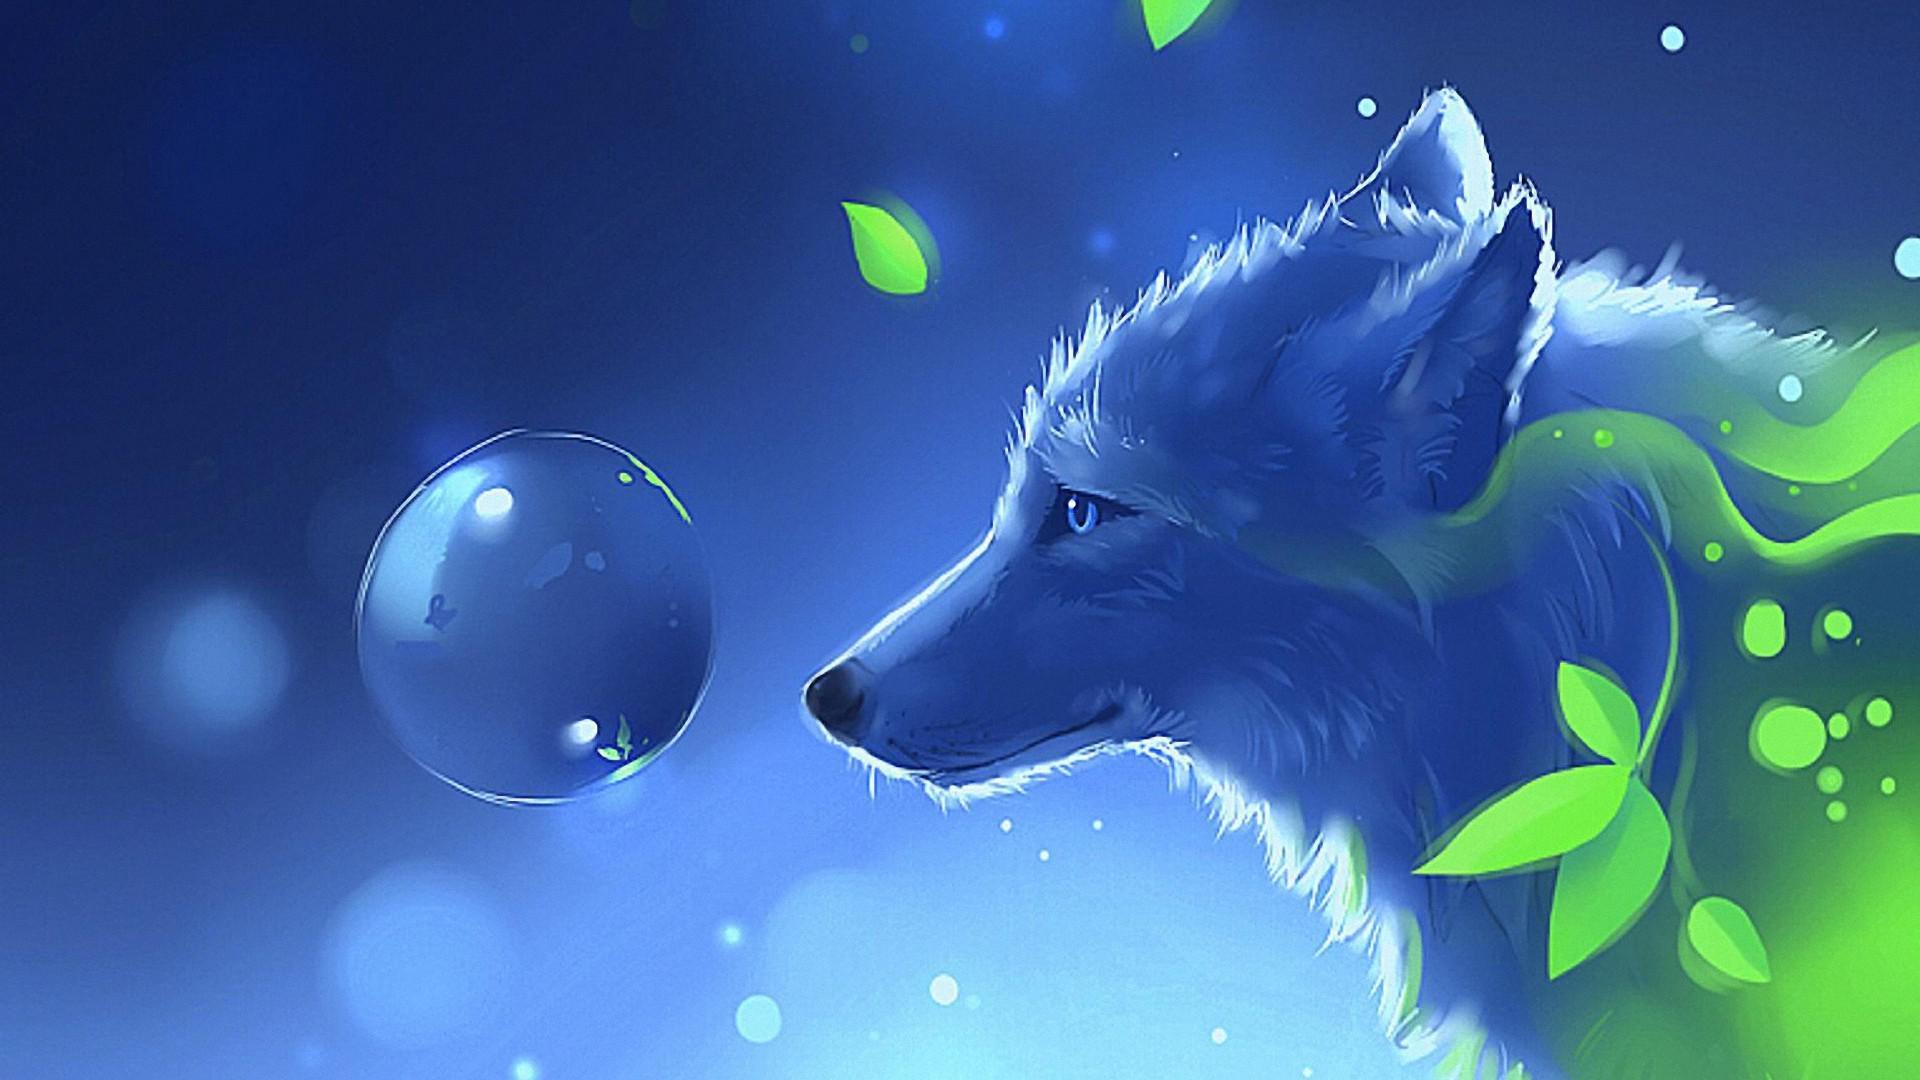 Hình nền 3D sói